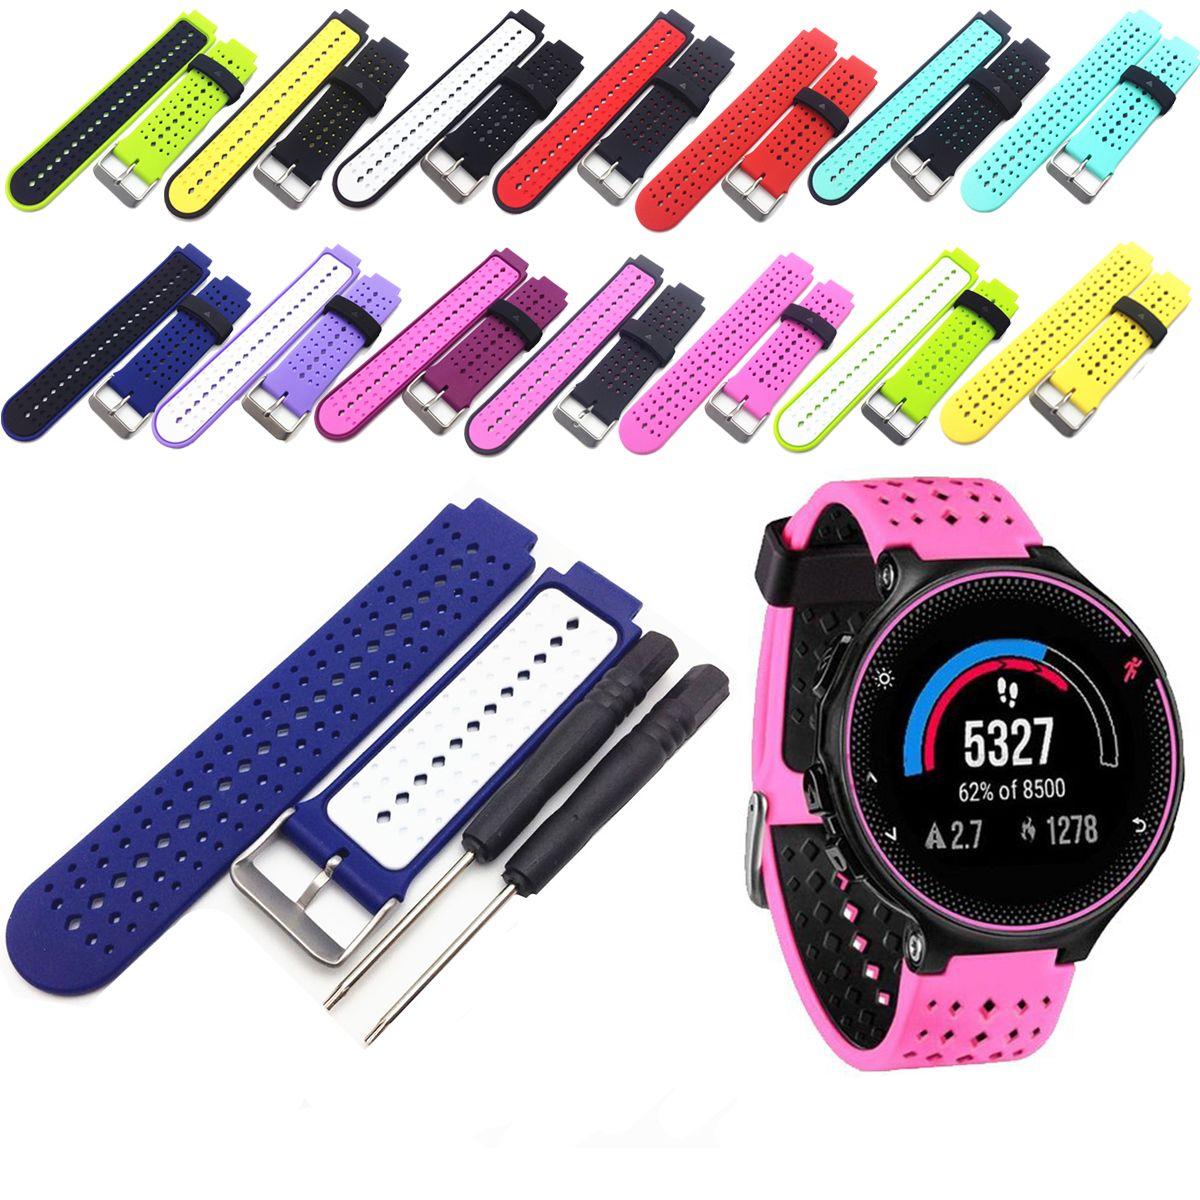 FC0038 Newest Replacement Universal Watchband Smart Watch Bracelet  Wristband for Garmin Forerunner 220/230/235/620/630 GPS Watch Adjustable